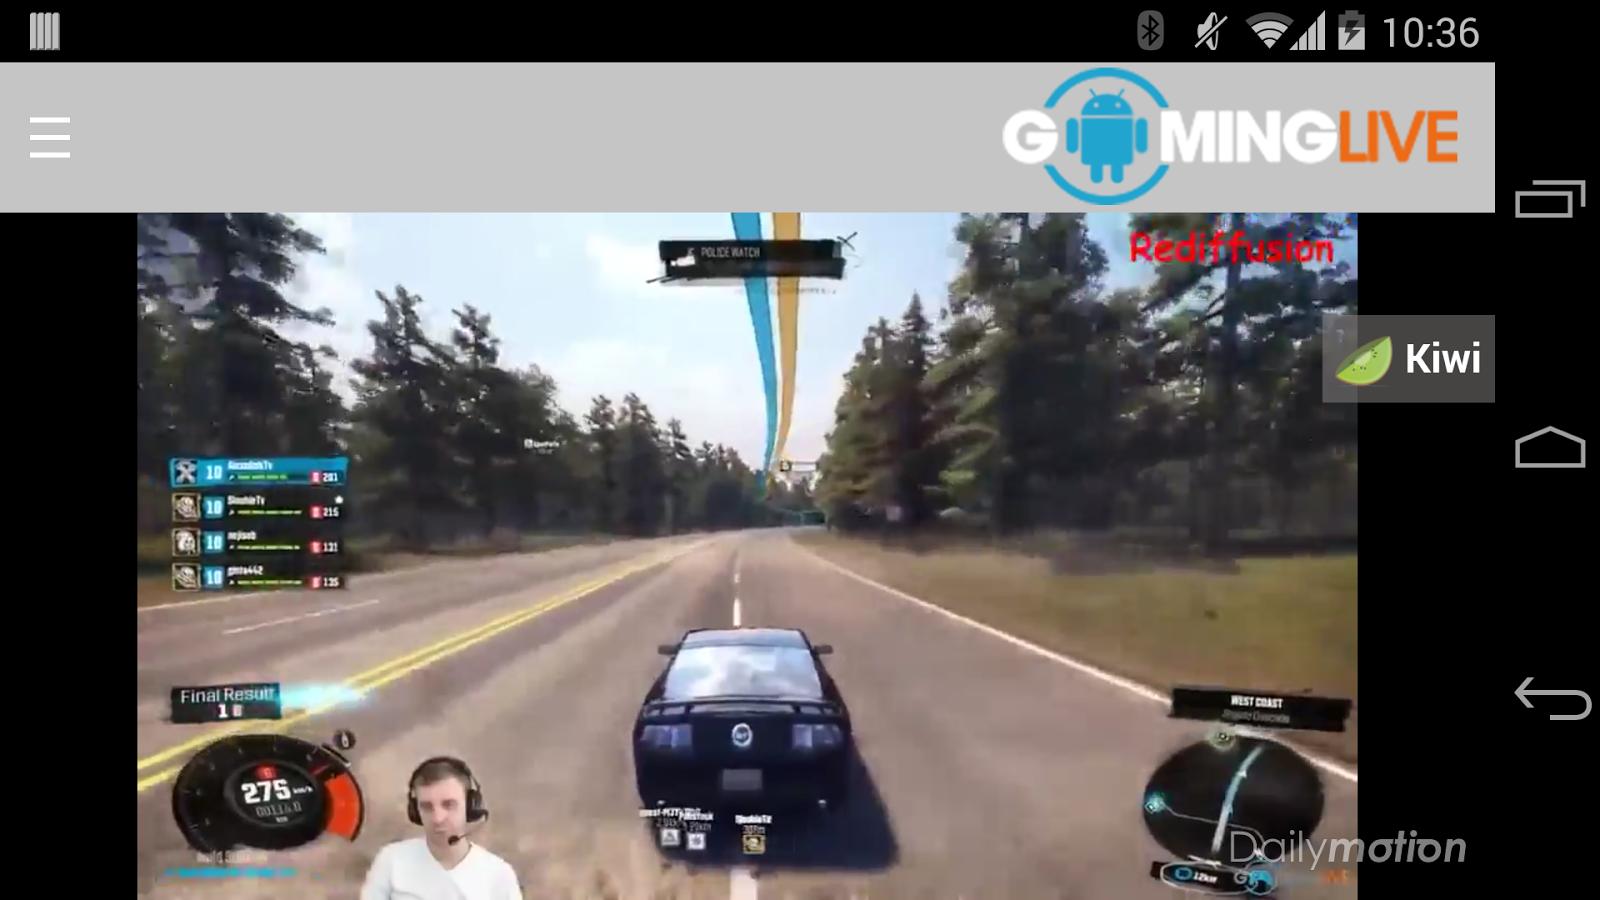 Gaming Live截图4